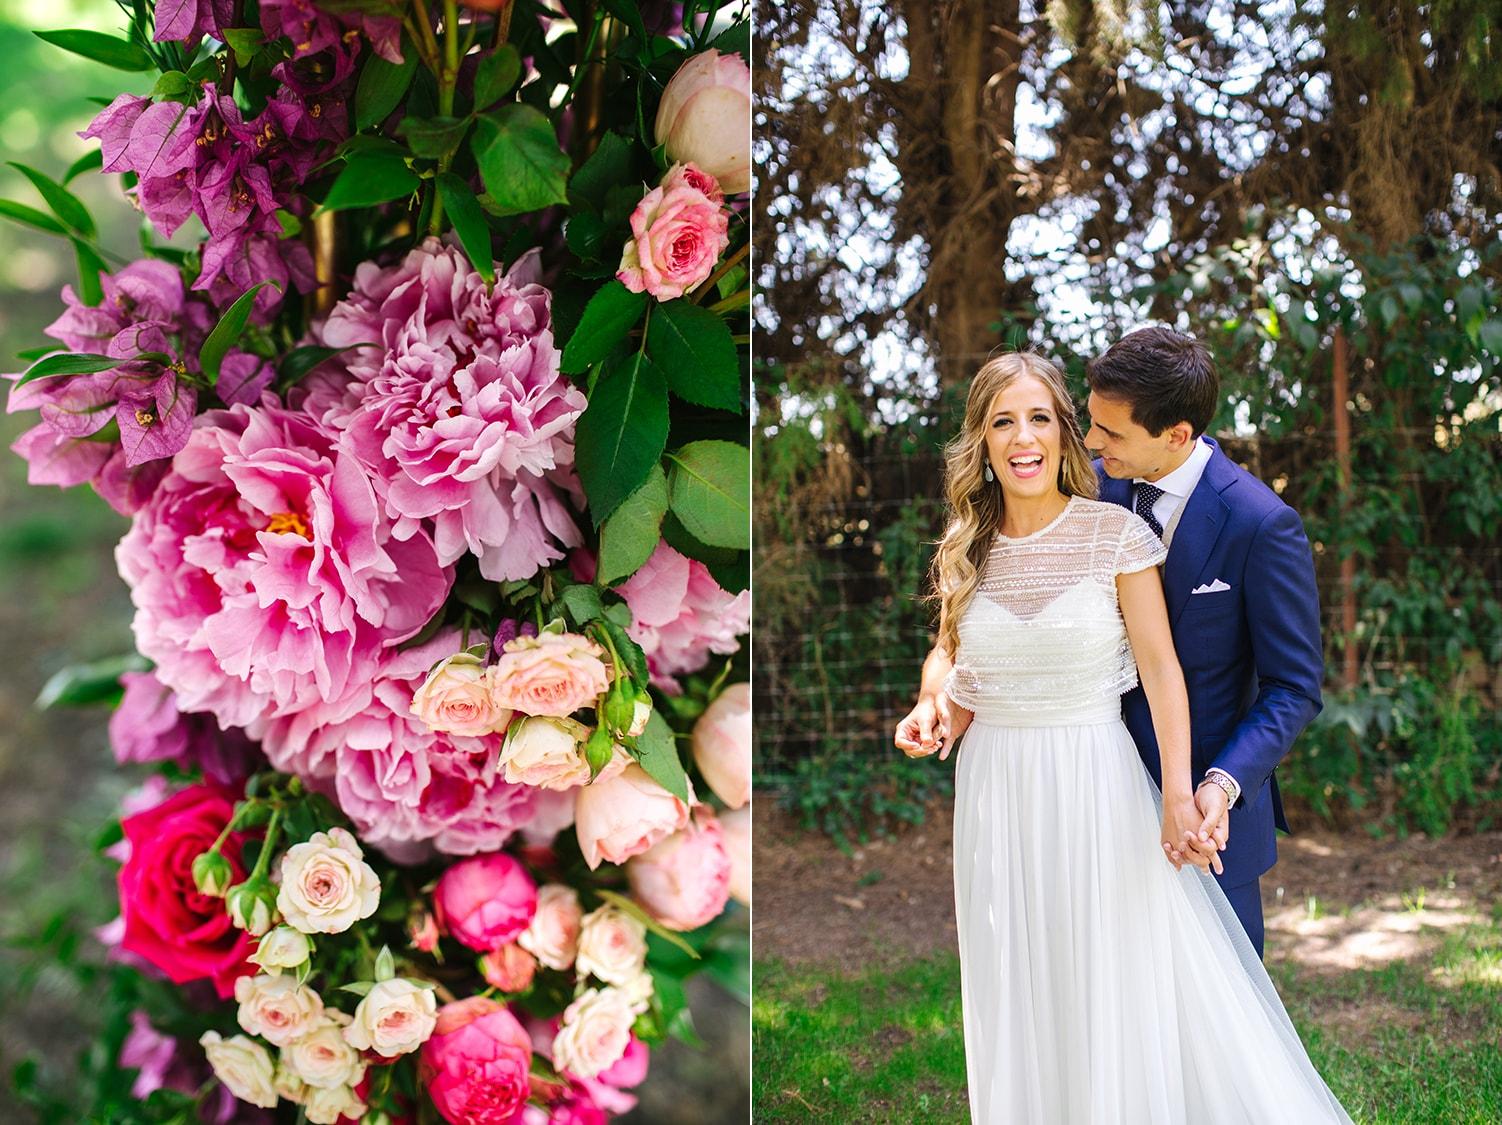 paulagfurio_bouganvillea_wedding_spain_006.jpg